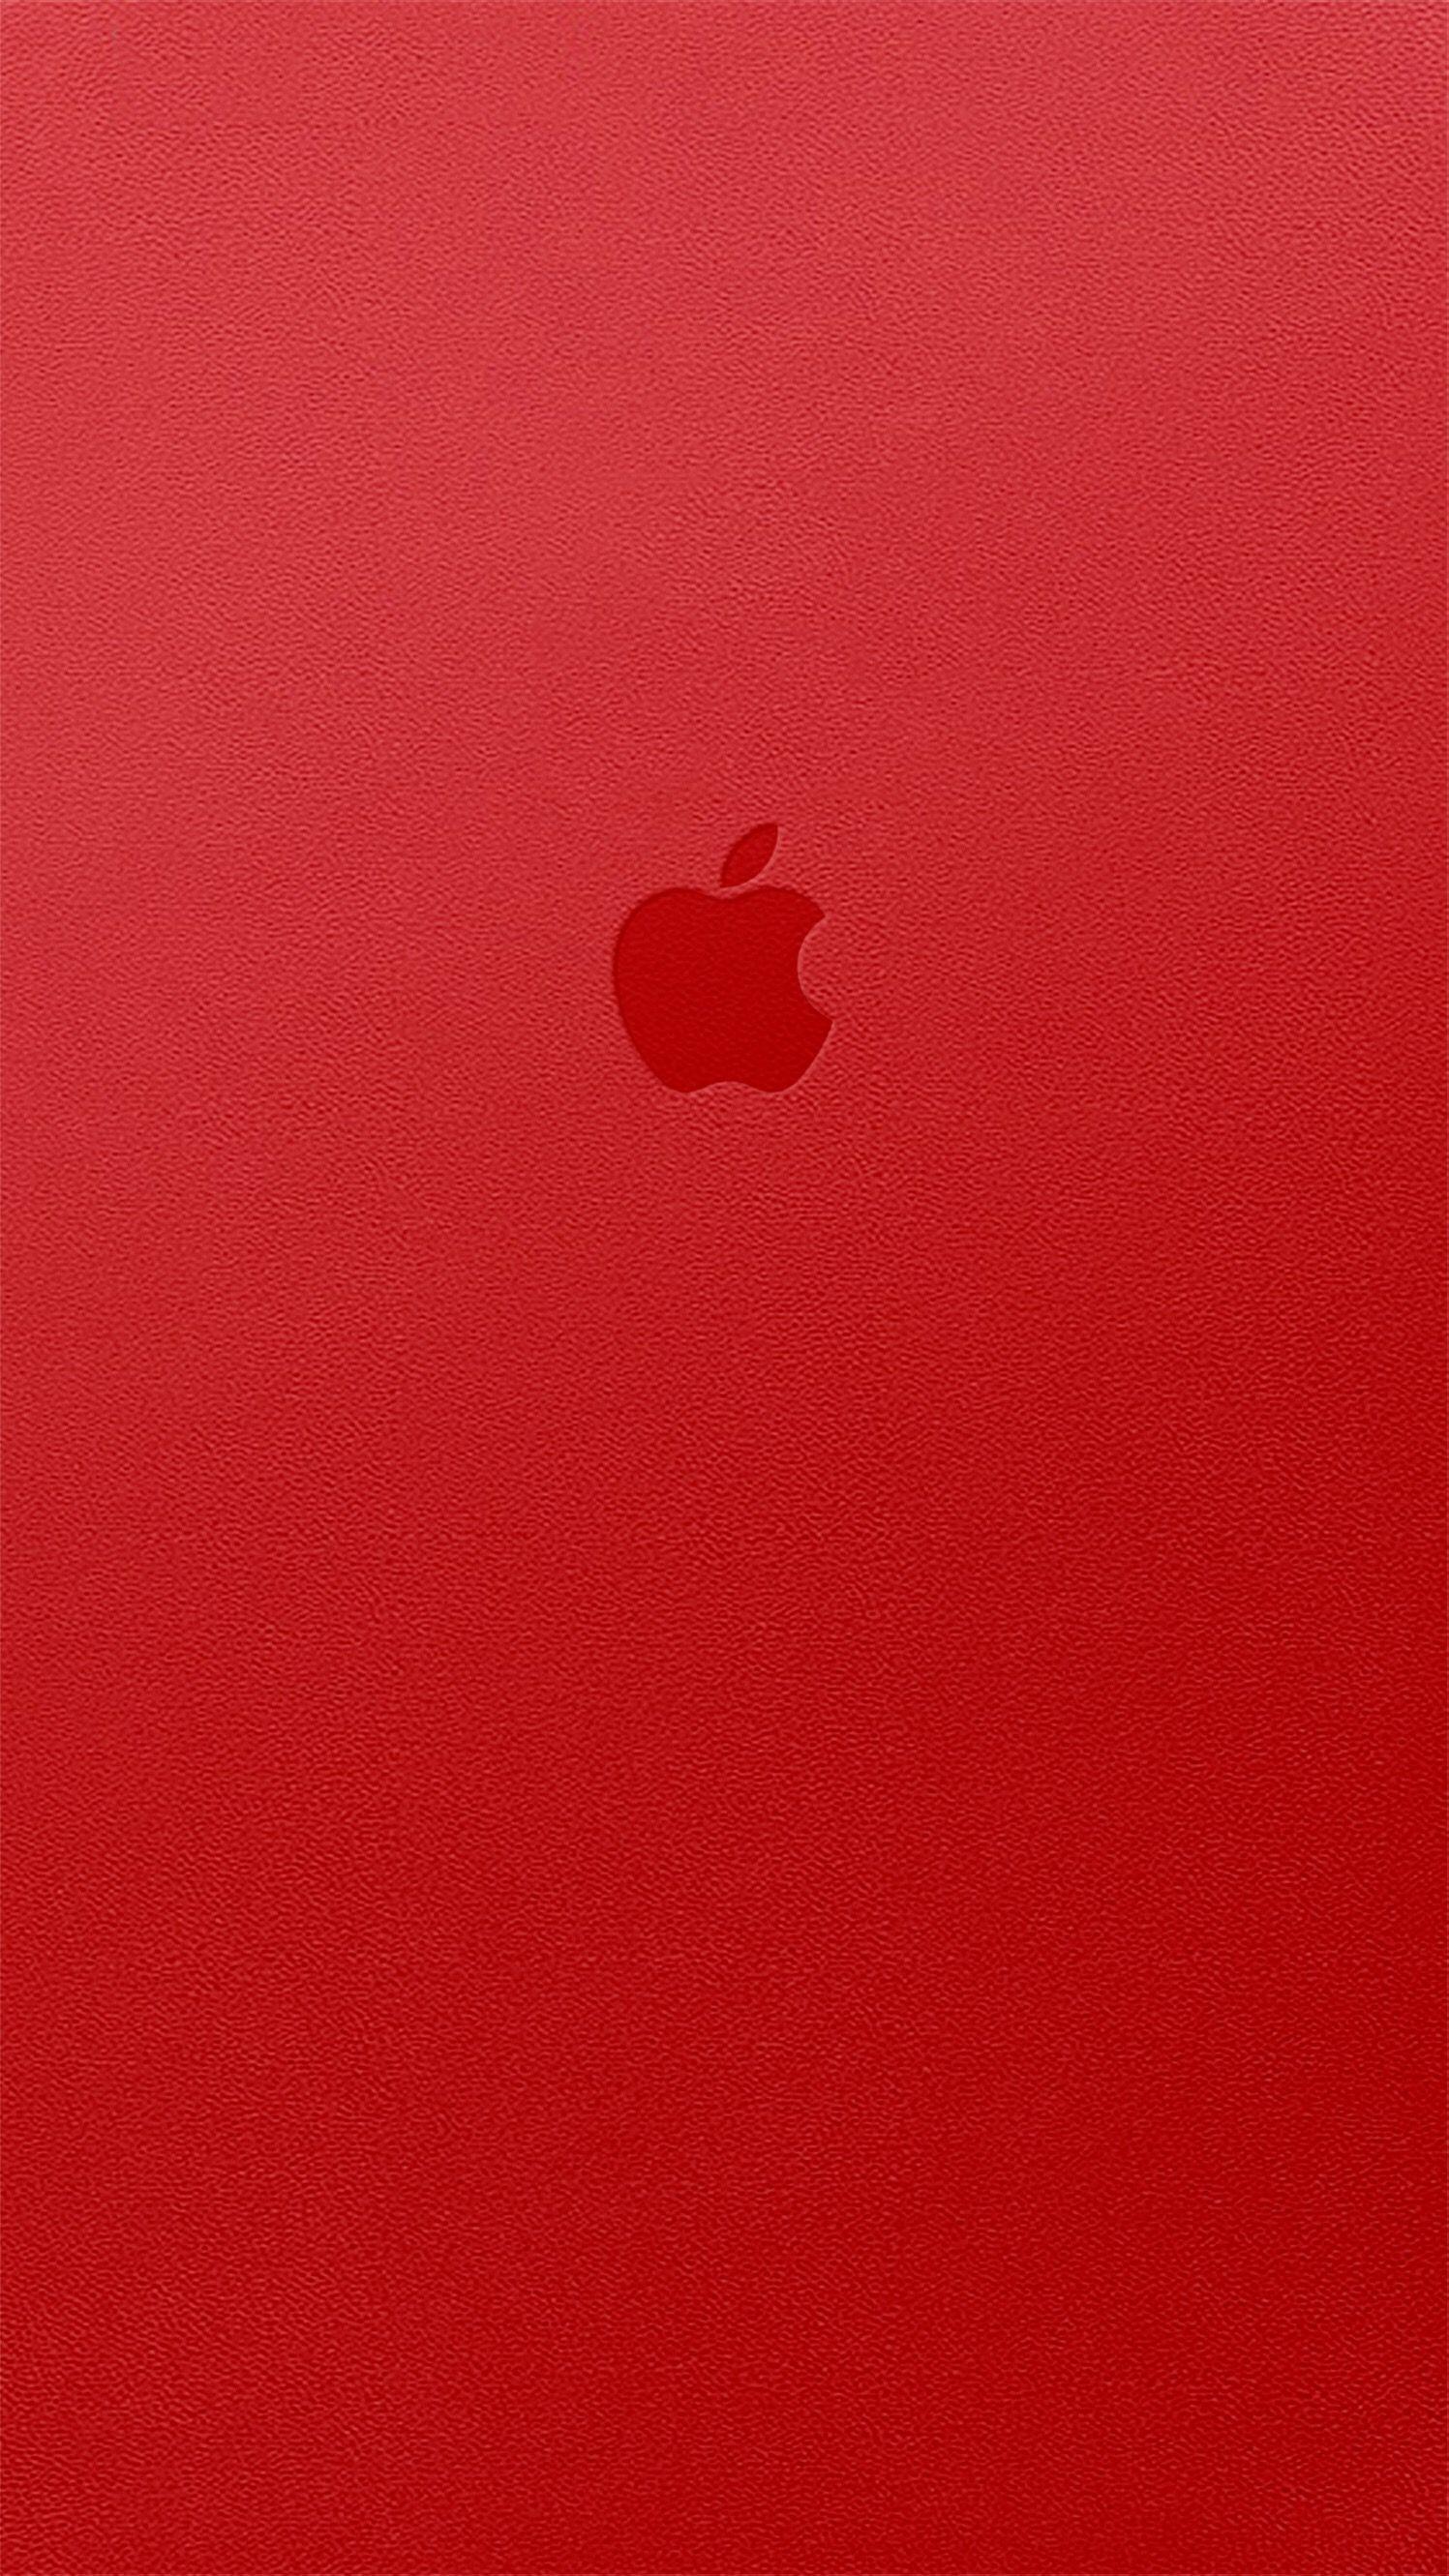 Iphone X Wallpaper Hd 2 Media File Pixelstalk Net Iphone